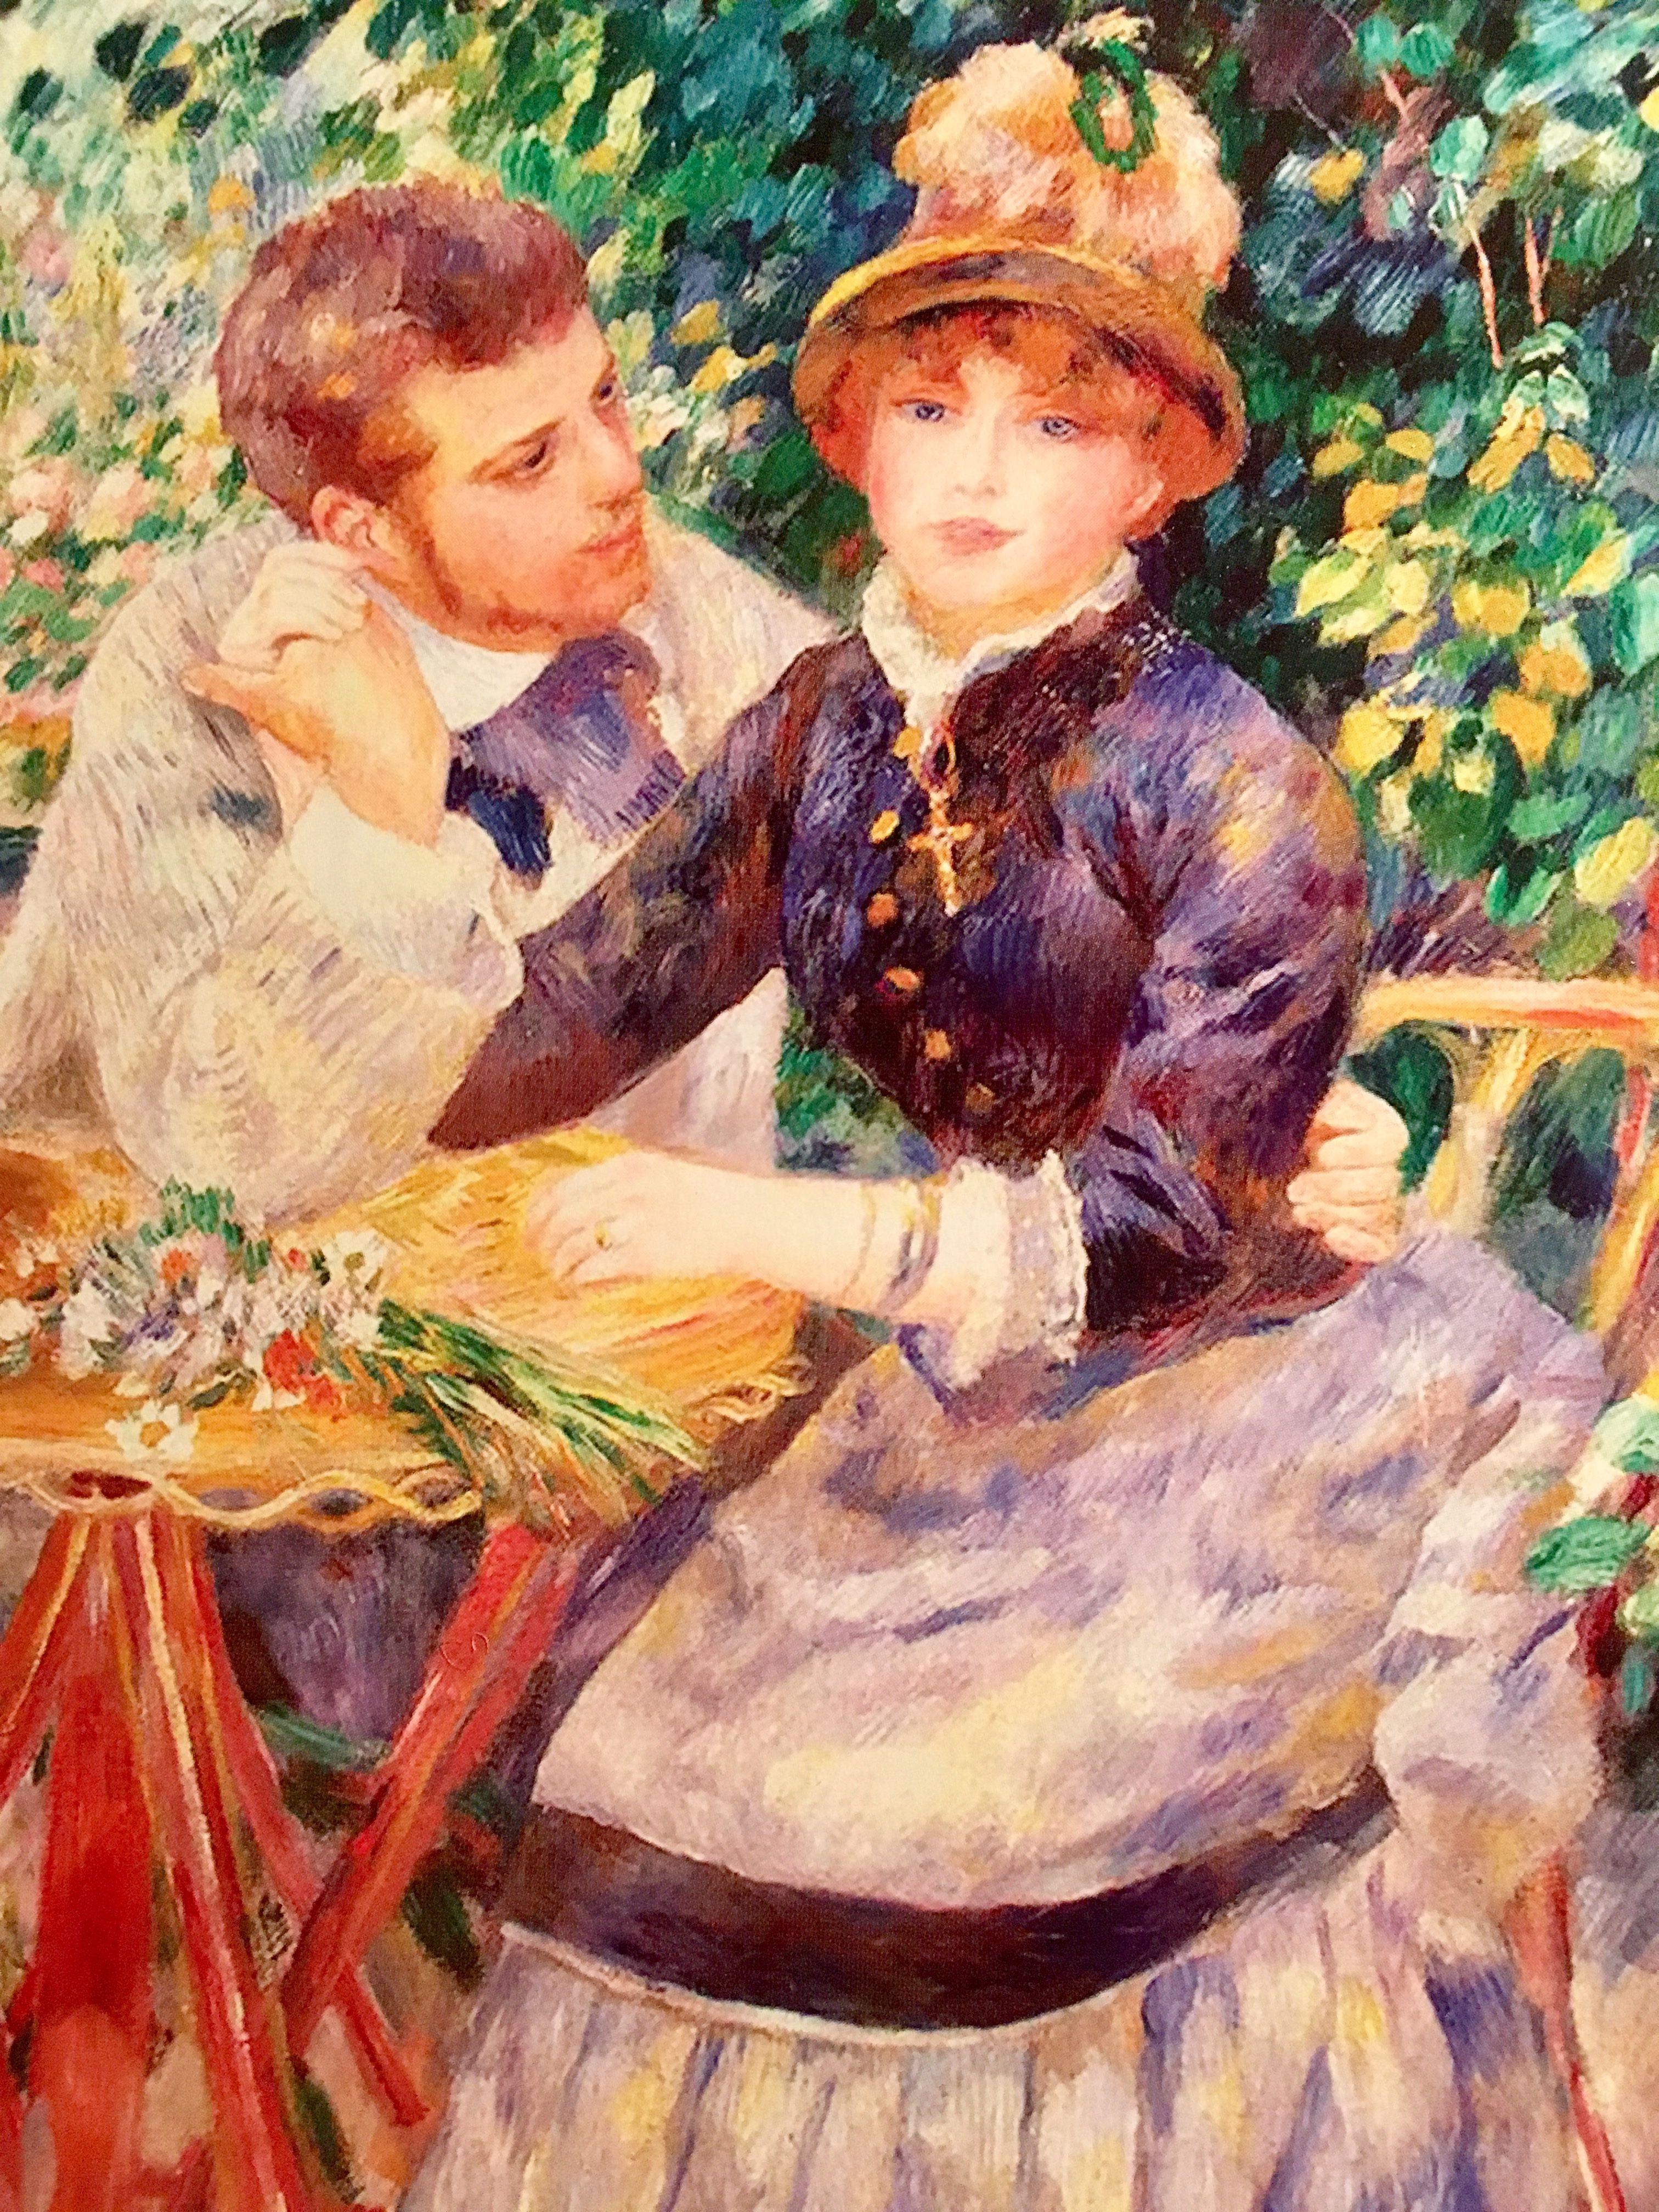 In The Garden Pierre Auguste Renoir 1885 Hermitage Museum St Petersburg Russia Hermitage Museum Art Pierre Auguste Renoir